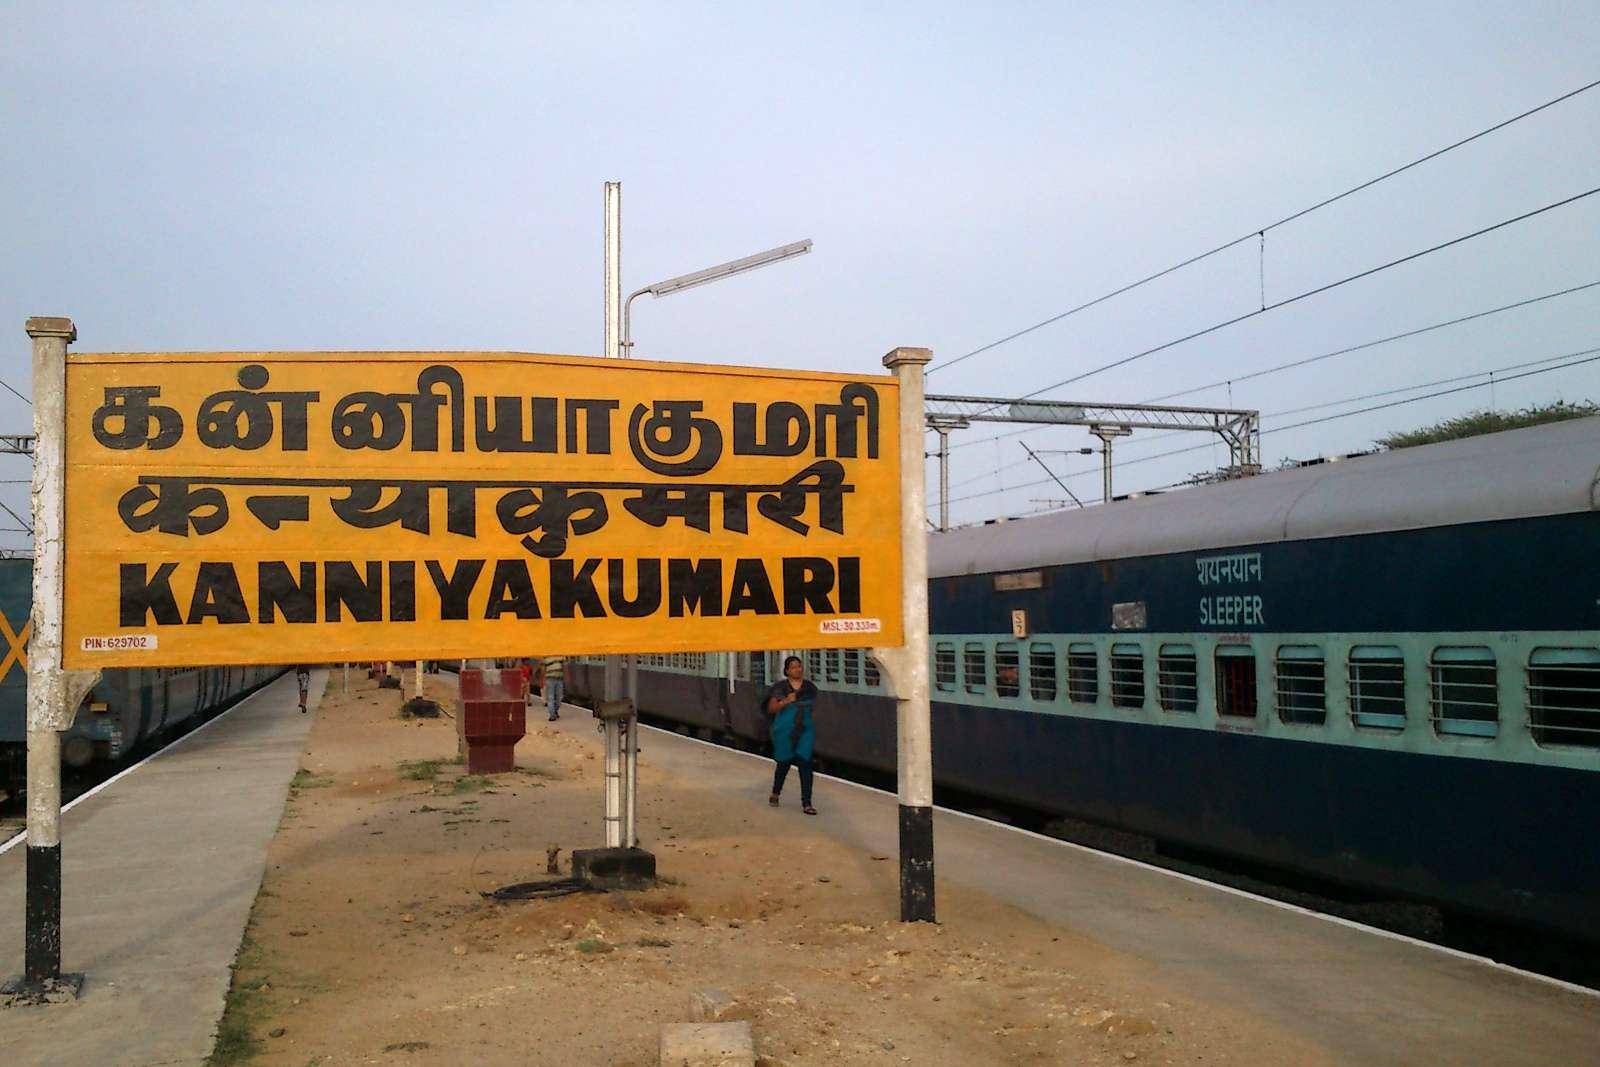 Large orange Kanyakumari railway station sign with sleeper train on tracks